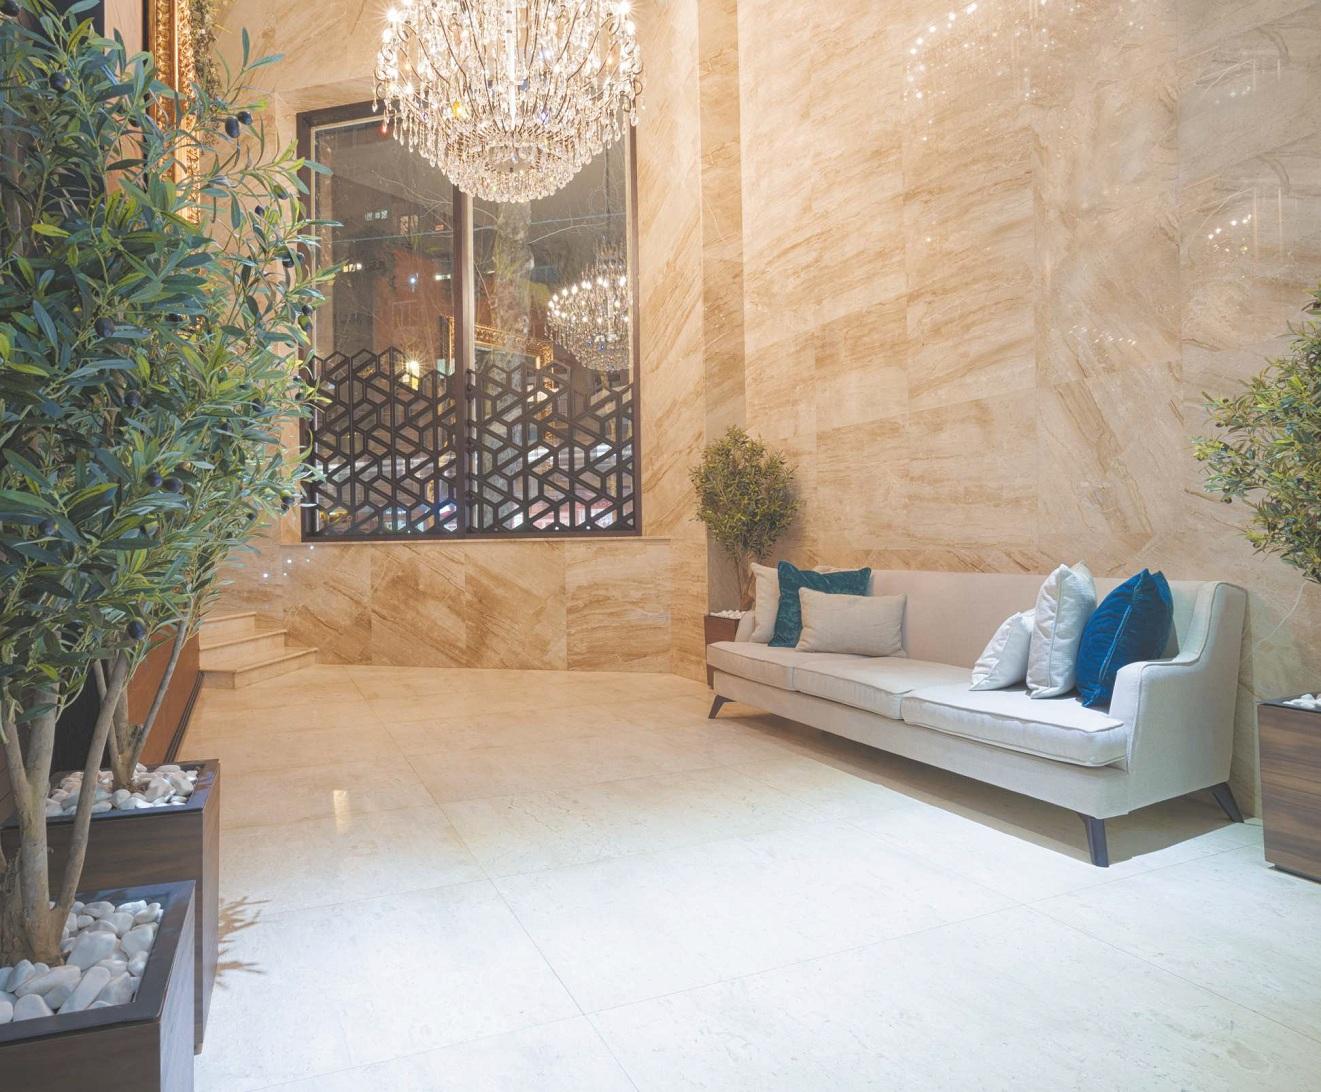 paradigm ariana residency project apartment interiors1